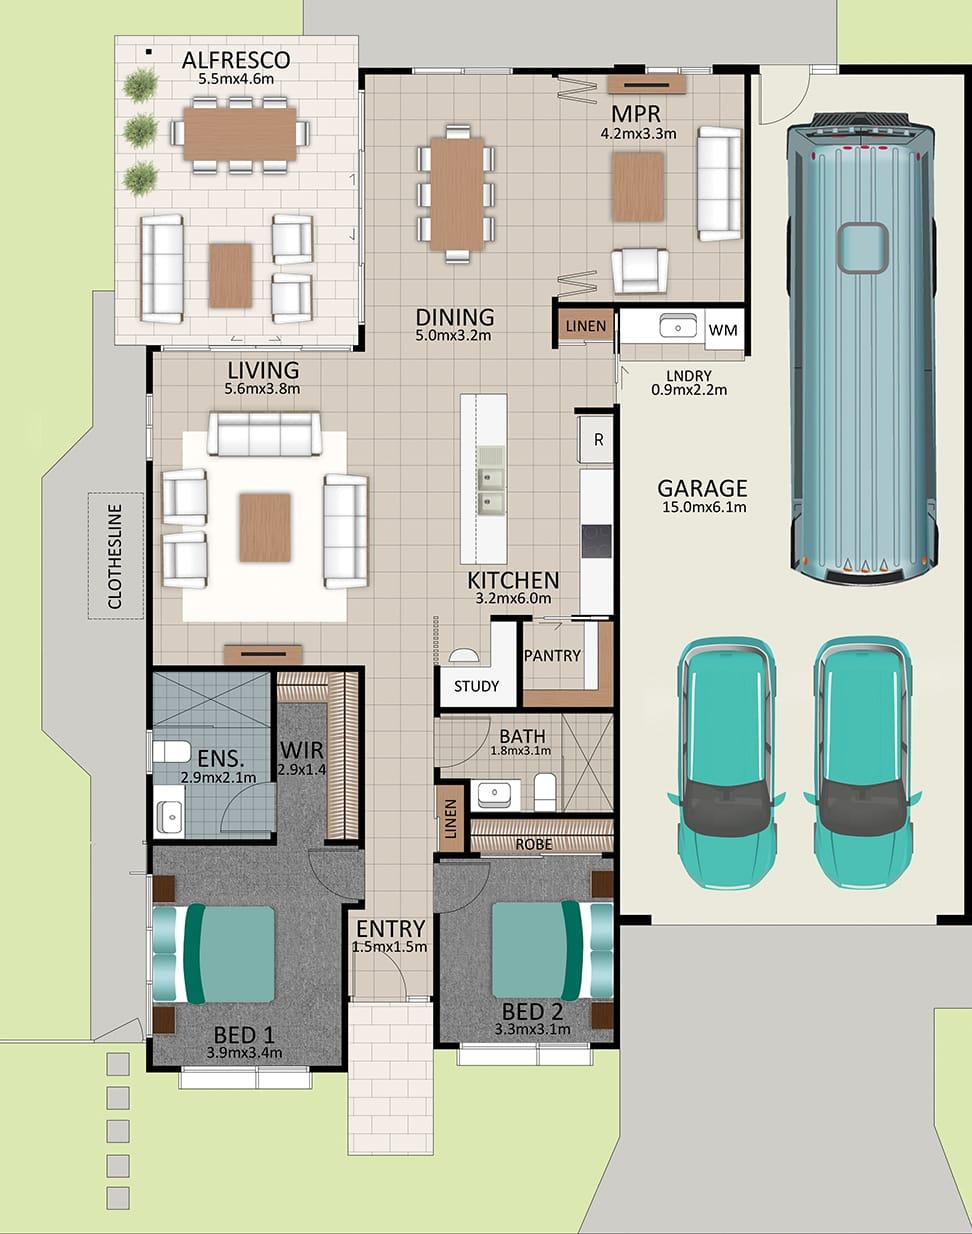 LR WEB LAT25 Floorplan LOT 183 Pepper NOV19 V1 - Lot 195